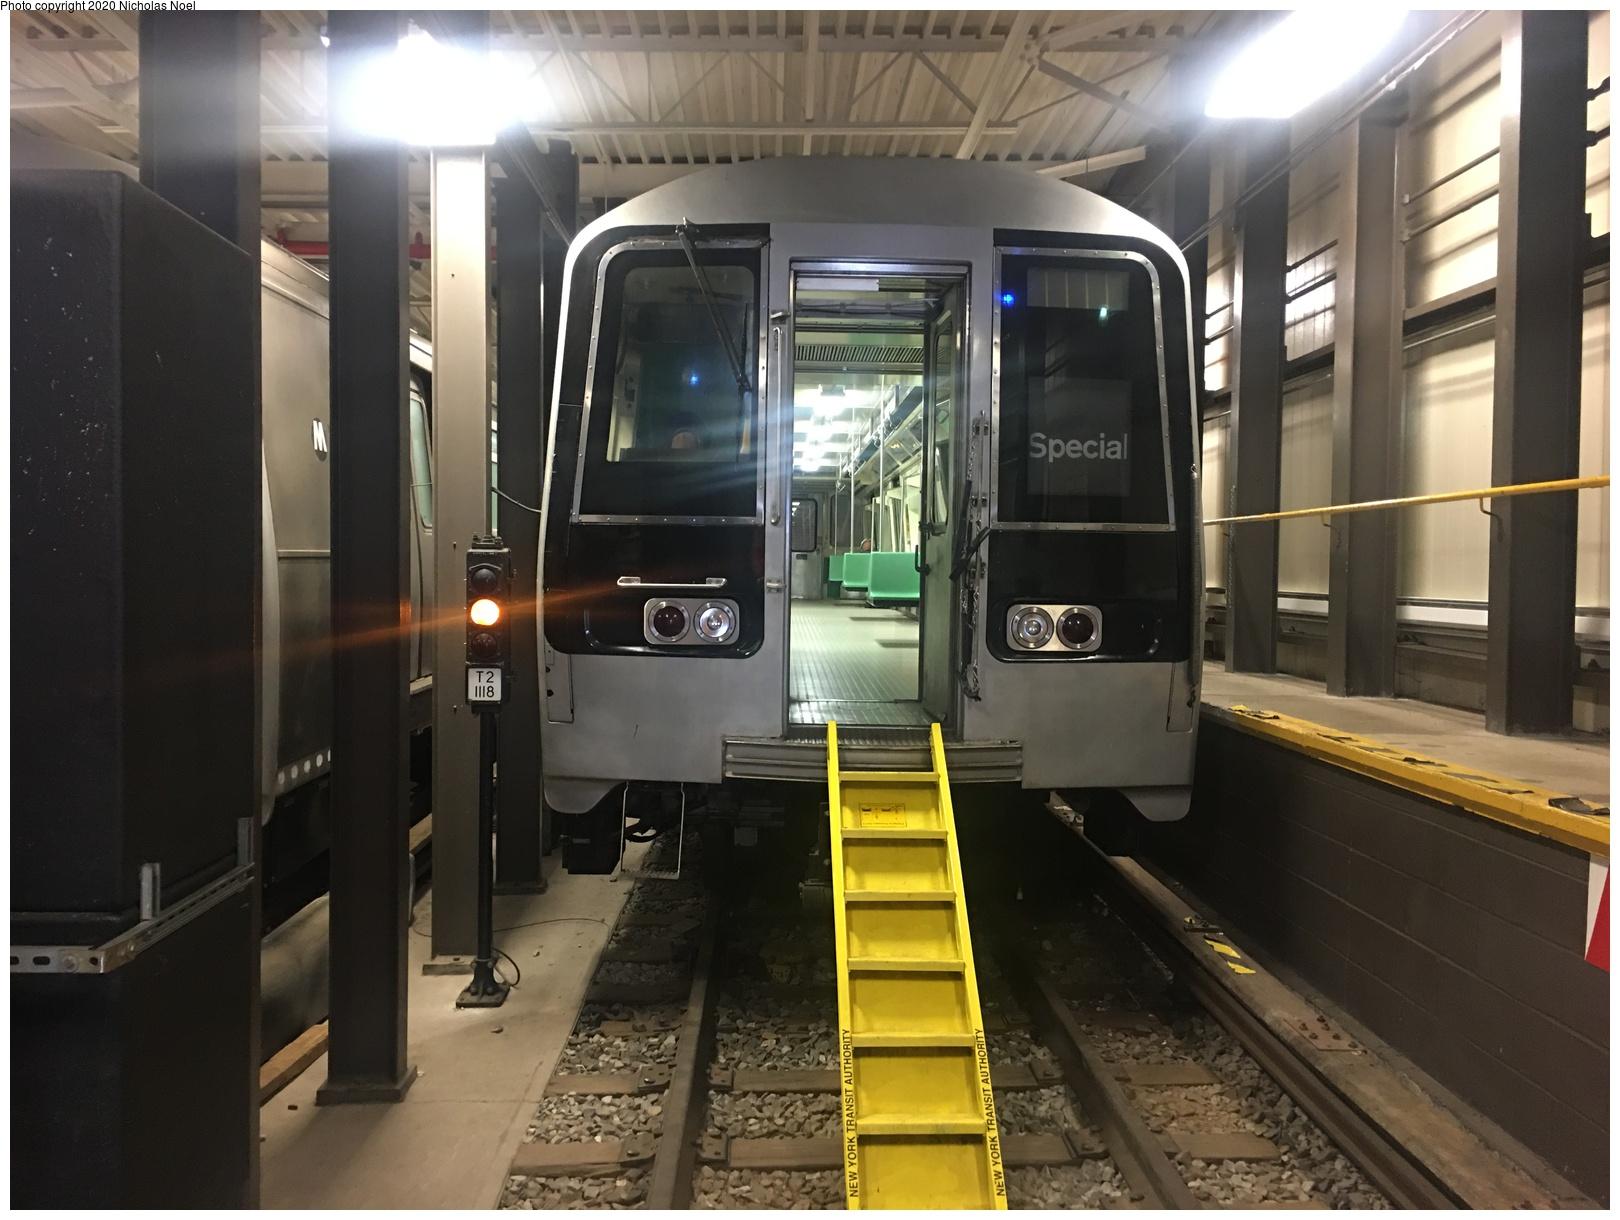 (547k, 1620x1220)<br><b>Country:</b> United States<br><b>City:</b> New York<br><b>System:</b> New York City Transit<br><b>Location:</b> Coney Island Yard-Training Facilities<br><b>Car:</b> R-110B (Bombardier, 1992) 3004 <br><b>Photo by:</b> Nicholas Noel<br><b>Date:</b> 10/17/2019<br><b>Viewed (this week/total):</b> 38 / 158